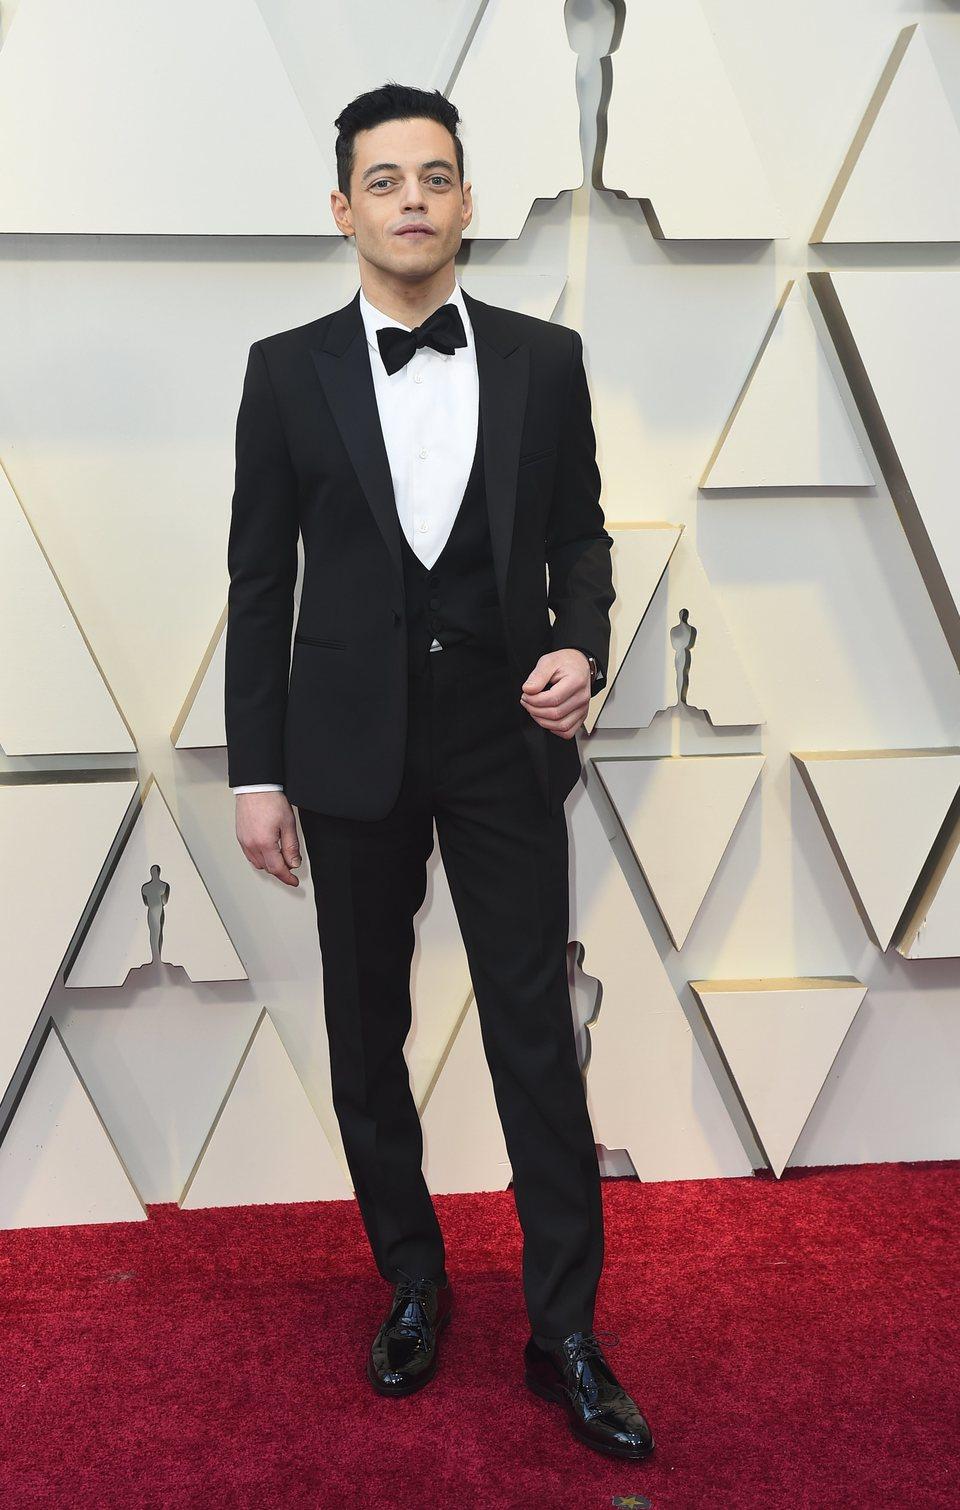 Rami Malek en la alfombra roja de los Oscar 2019